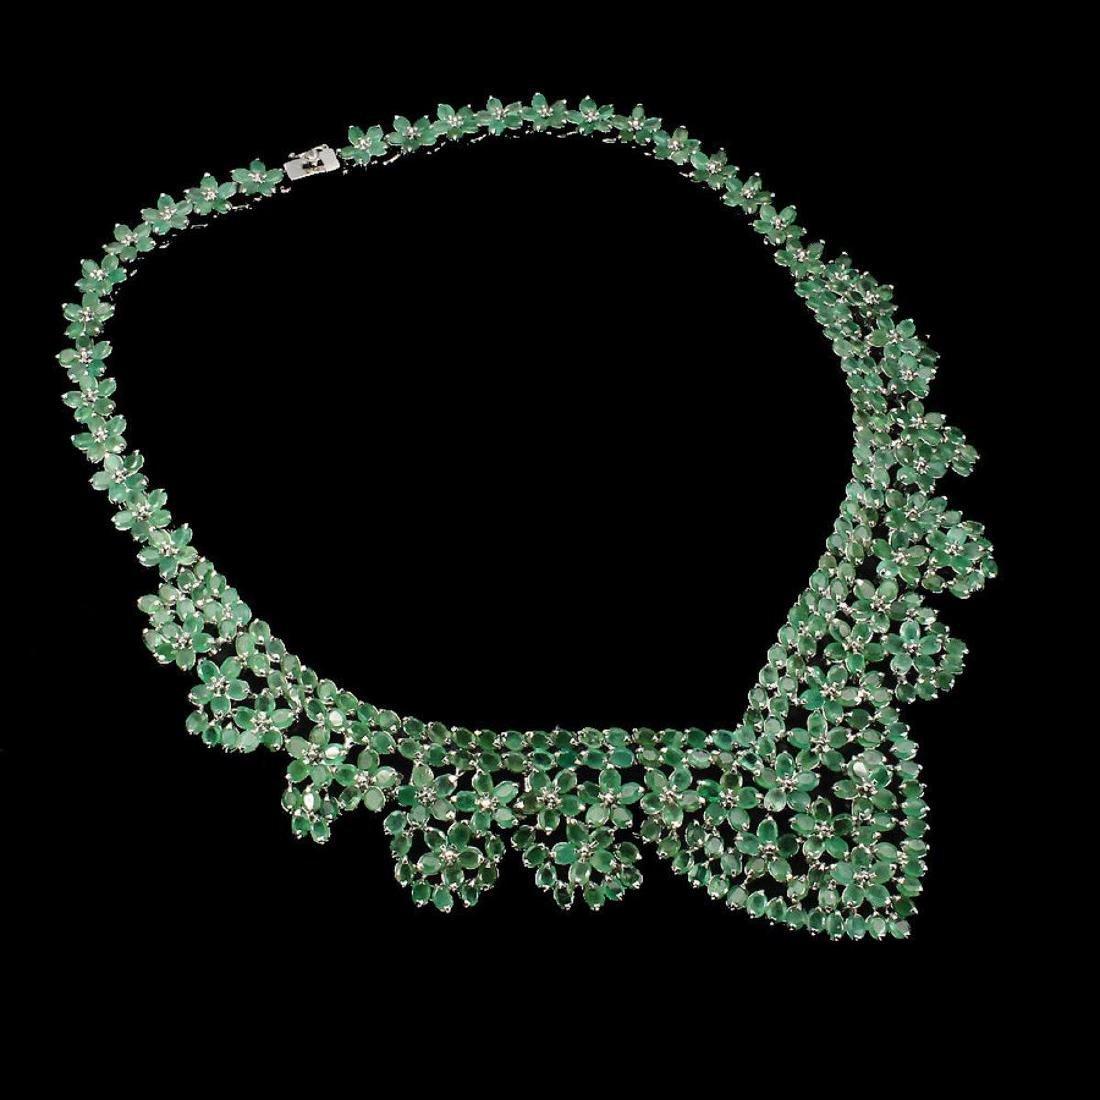 Natural Columbian Emerald 467 Ct Necklace - 2